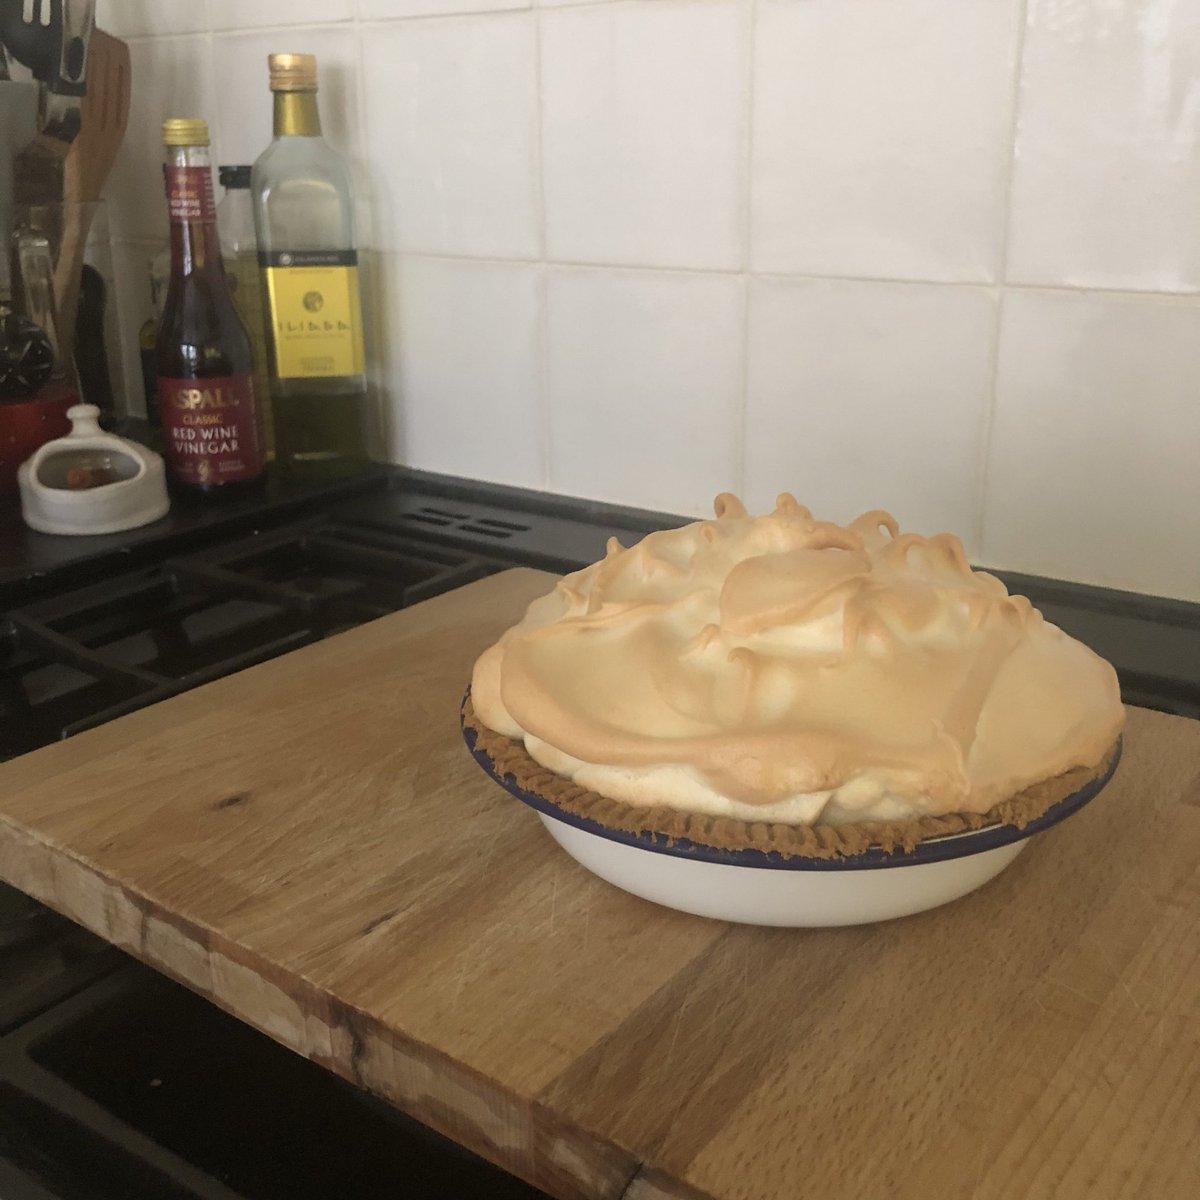 When life gives you lemons make lemon meringue pie #sundaylunch <br>http://pic.twitter.com/zBpIzhUnY9